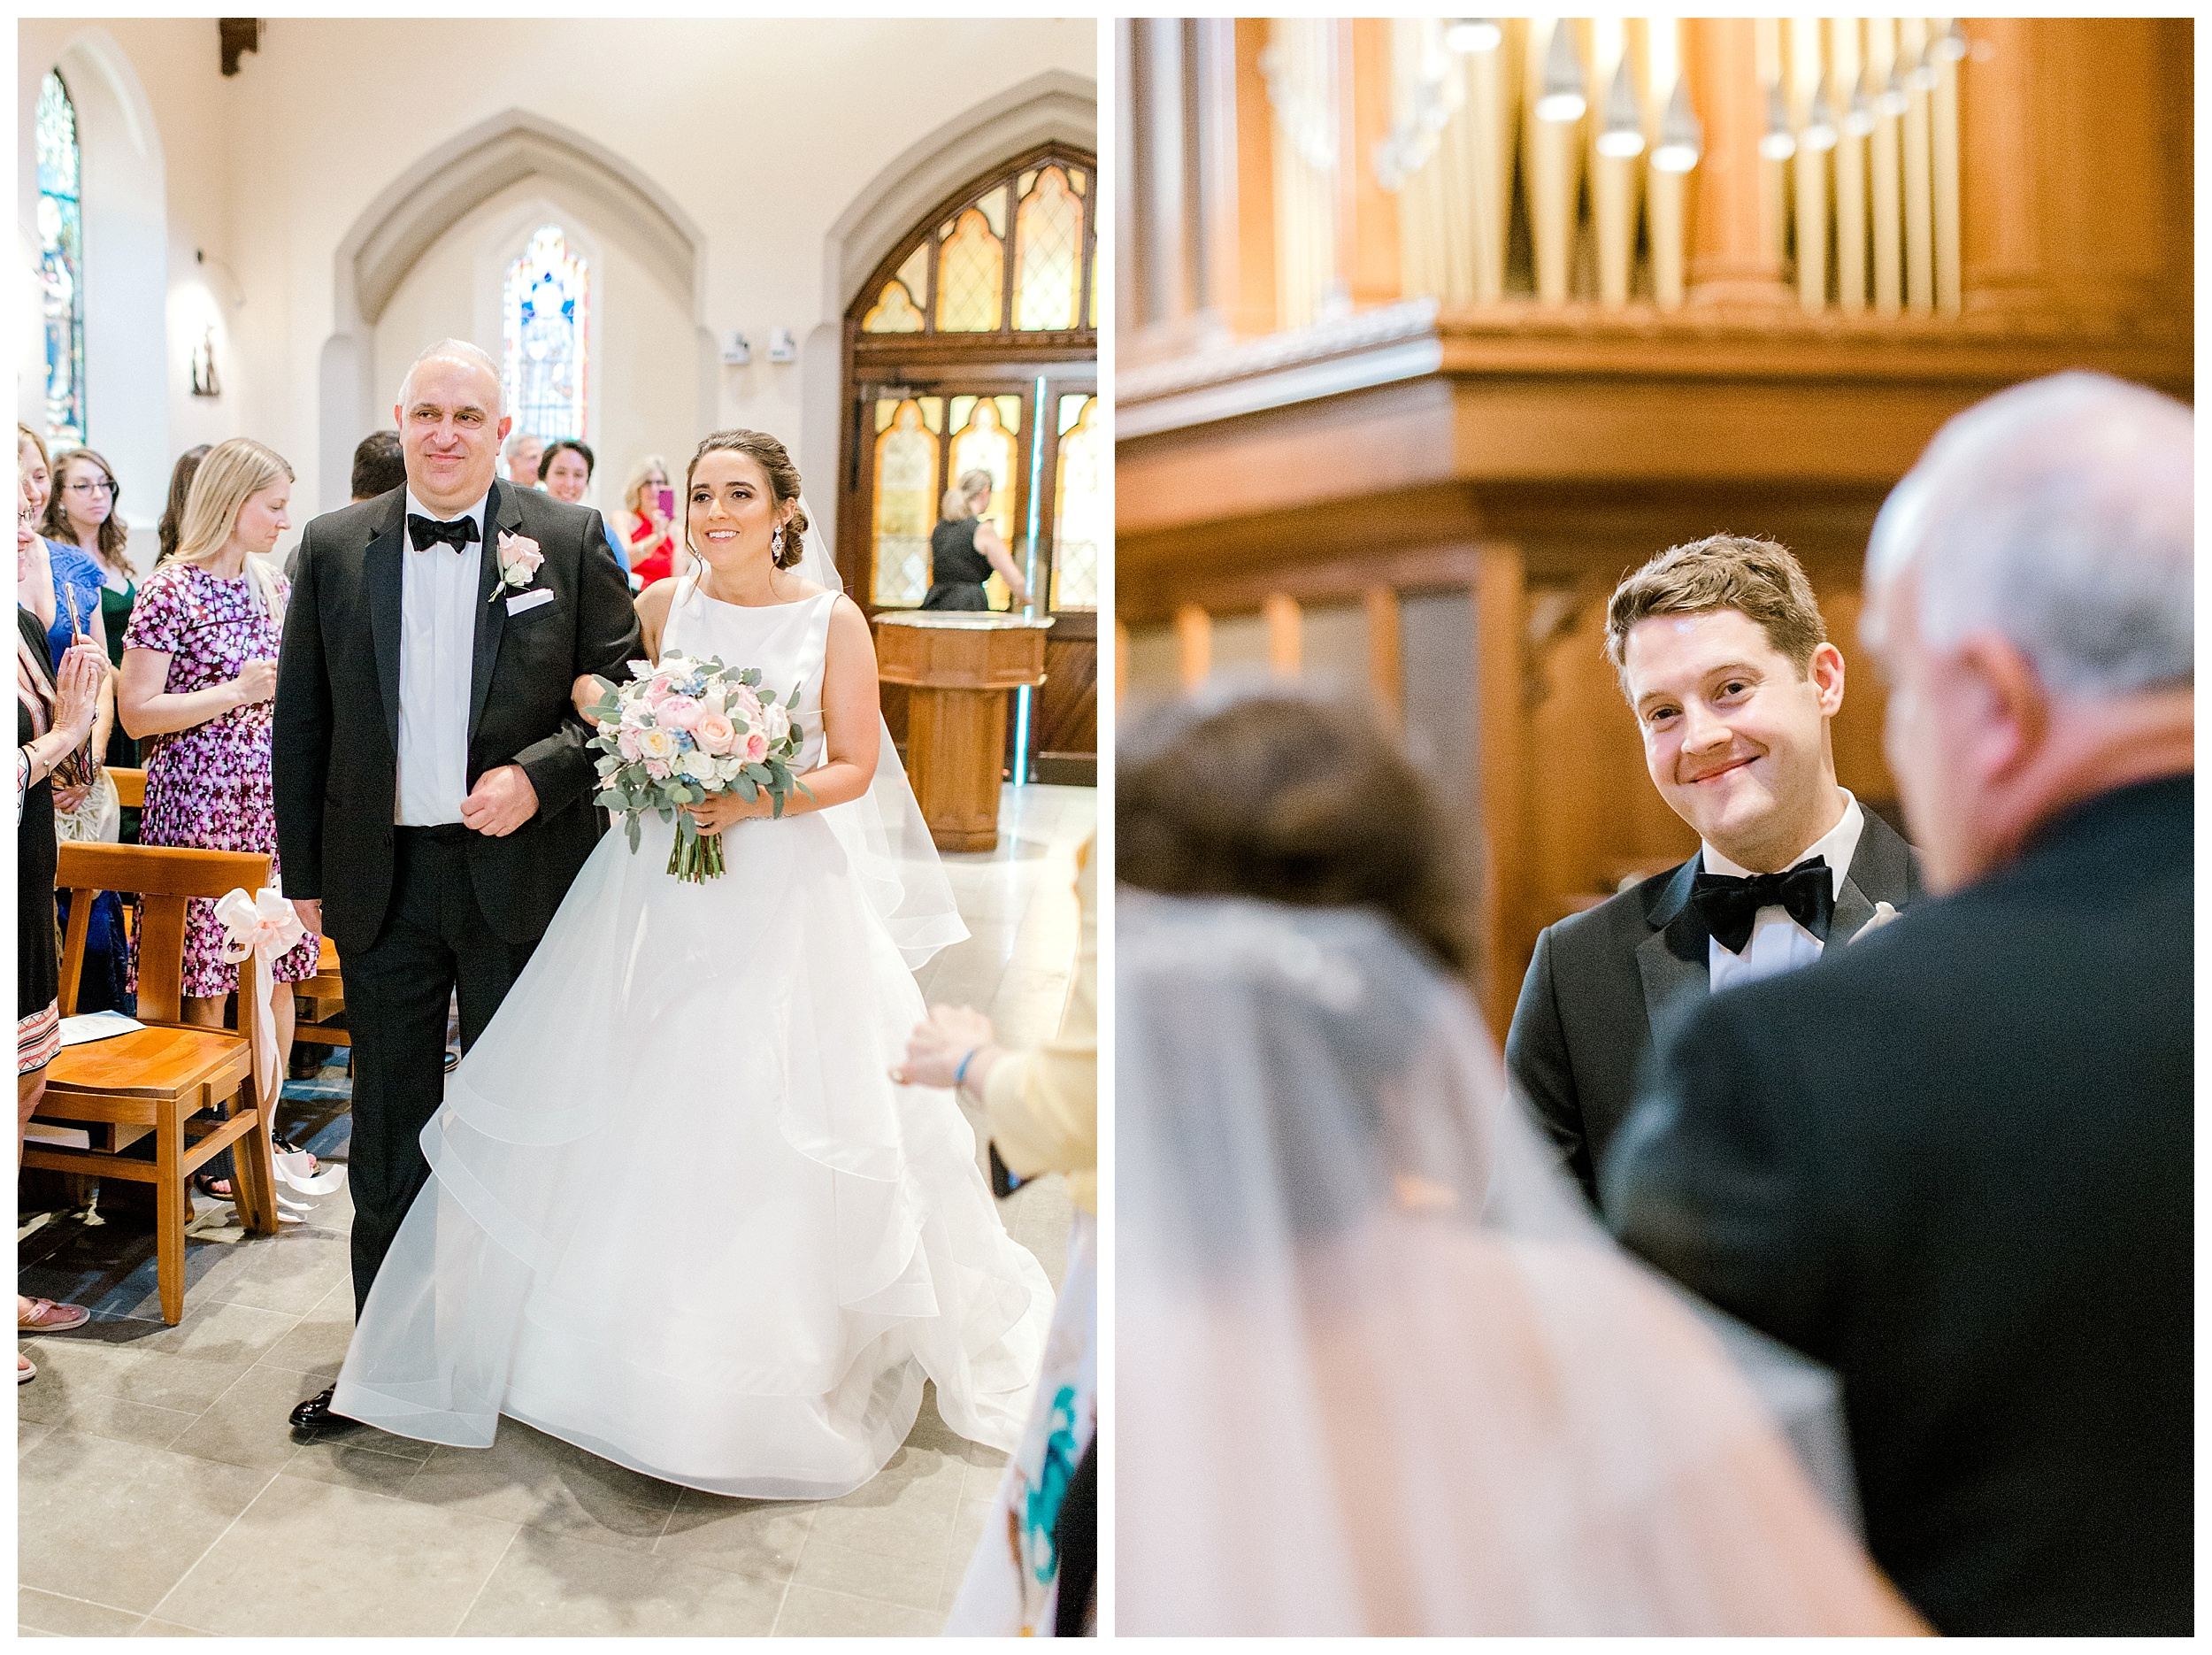 DAR Constitution Hall Wedding Wedding | Daughters of the American Revolution Wedding | District of Columbia Film Wedding Photographer Kir Tuben_0048.jpg